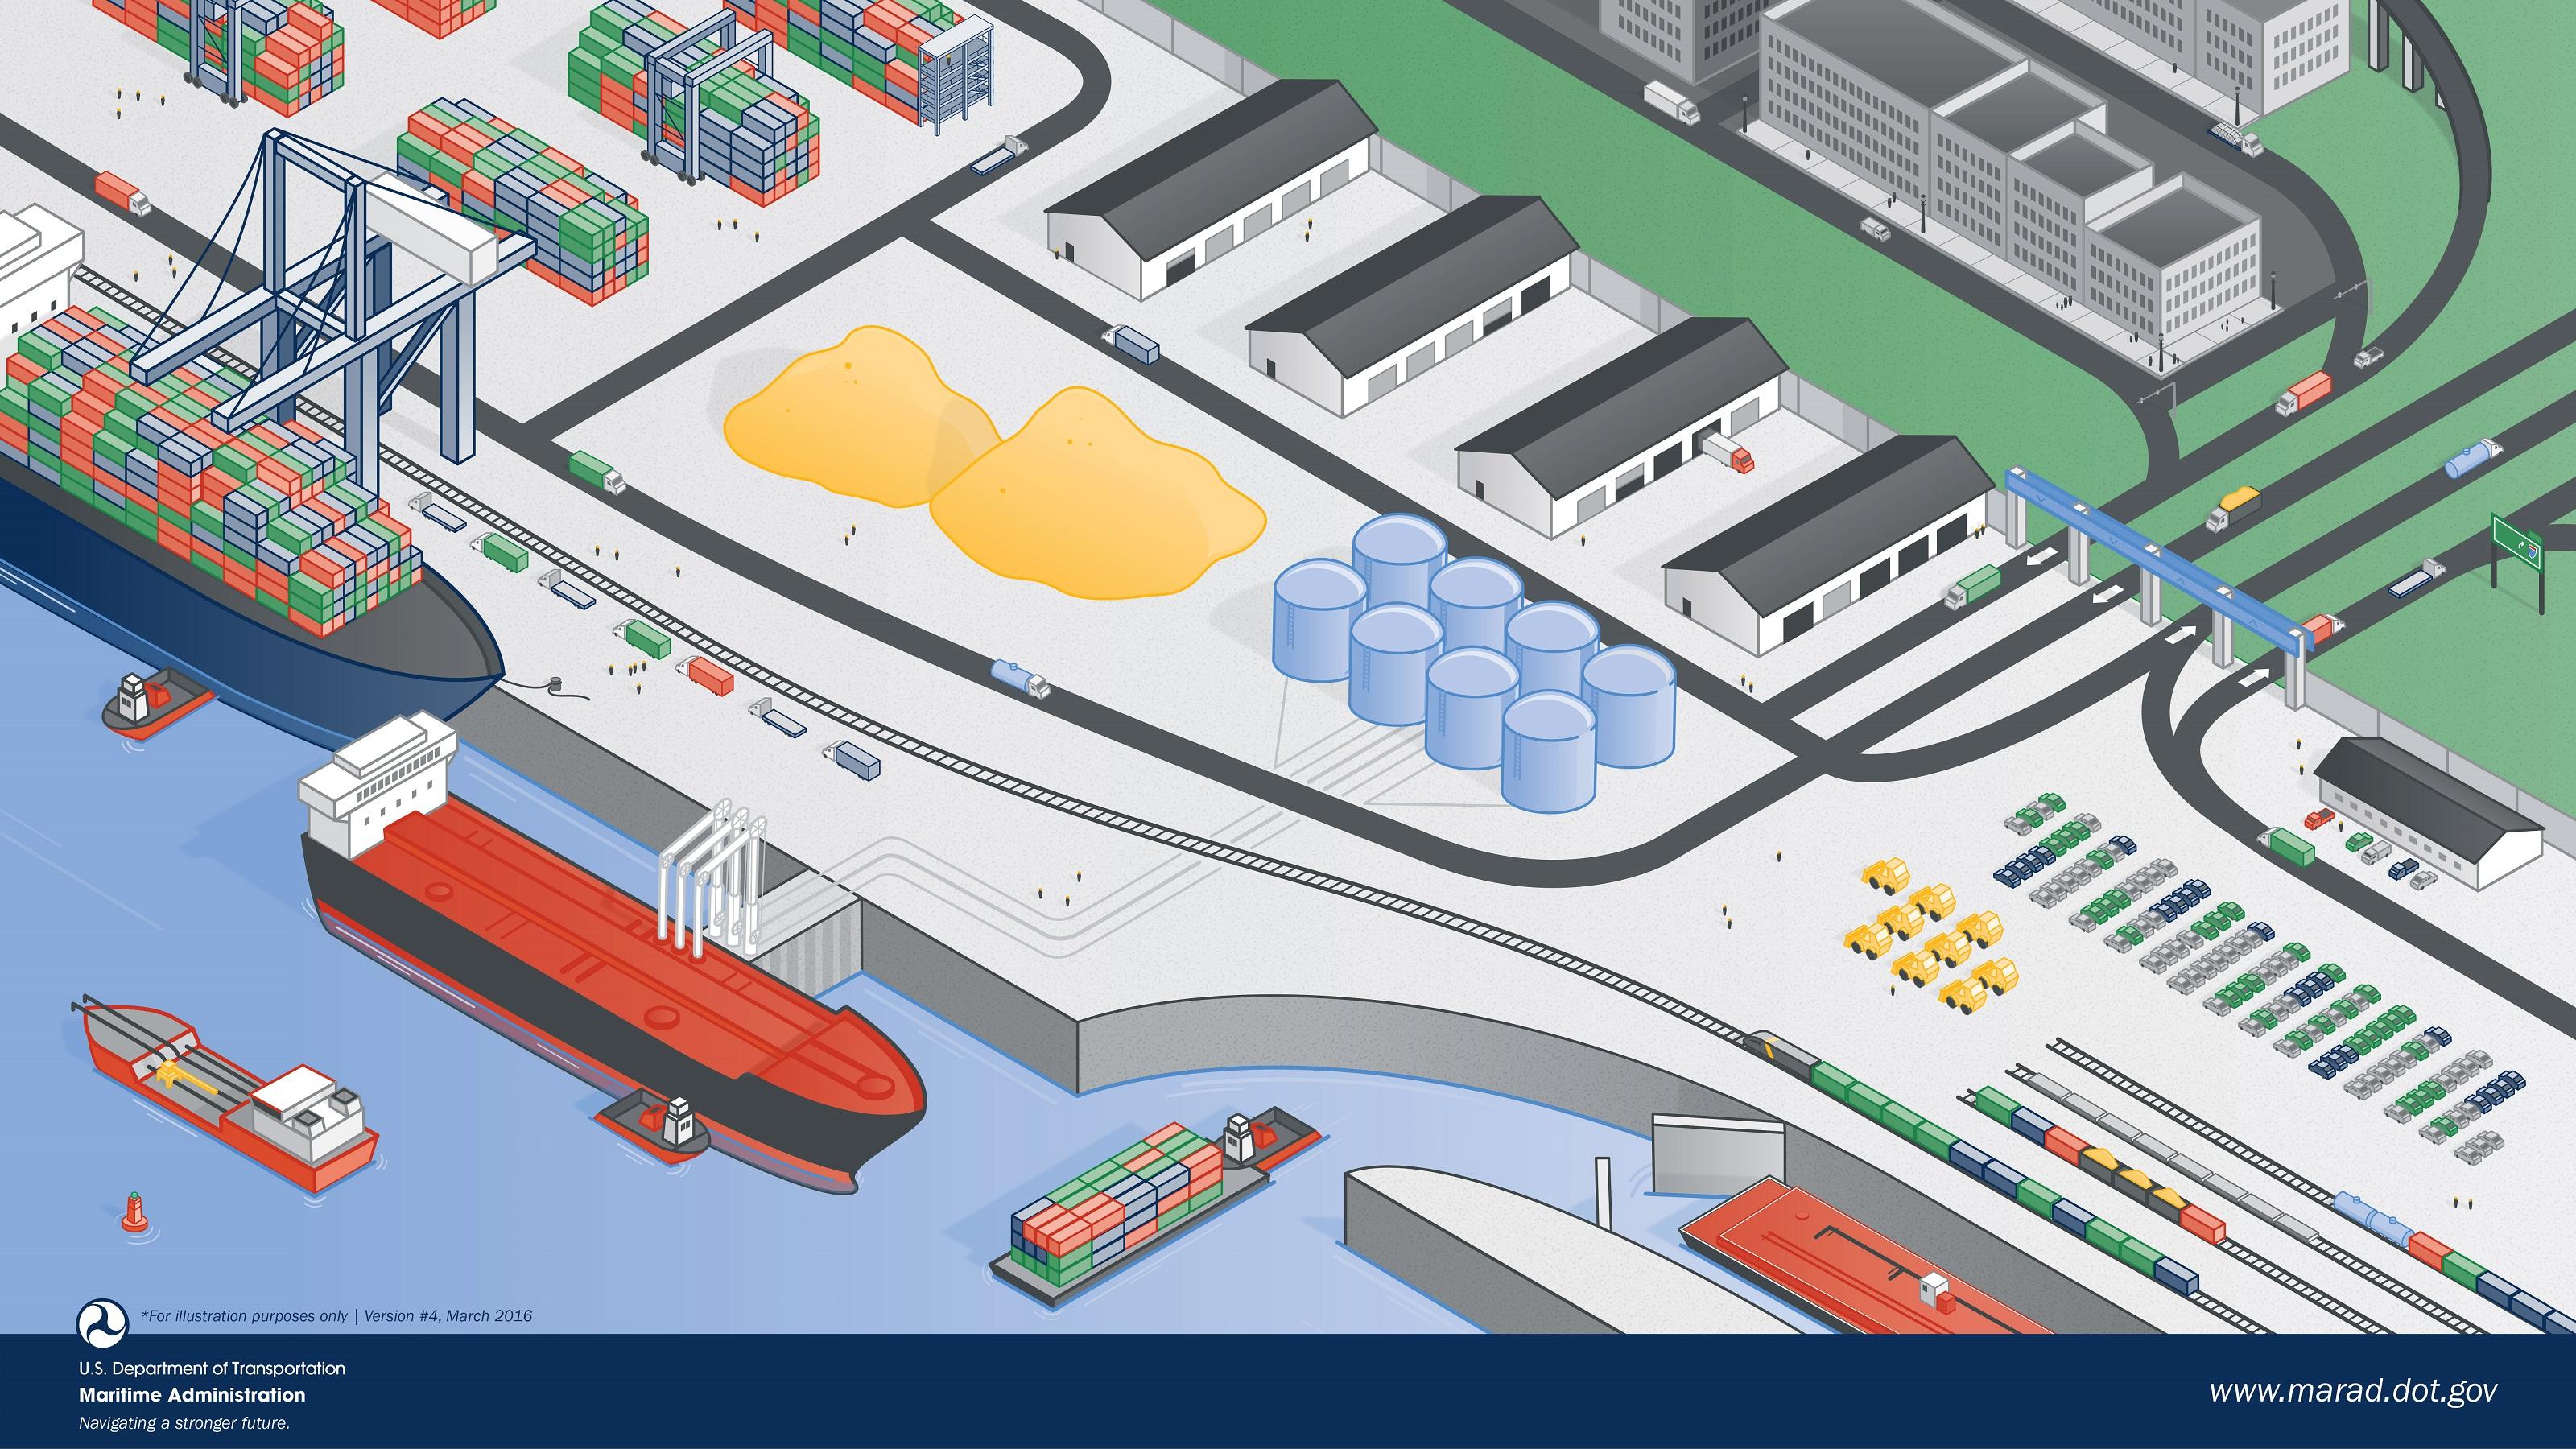 MARAD | Maritime Administration